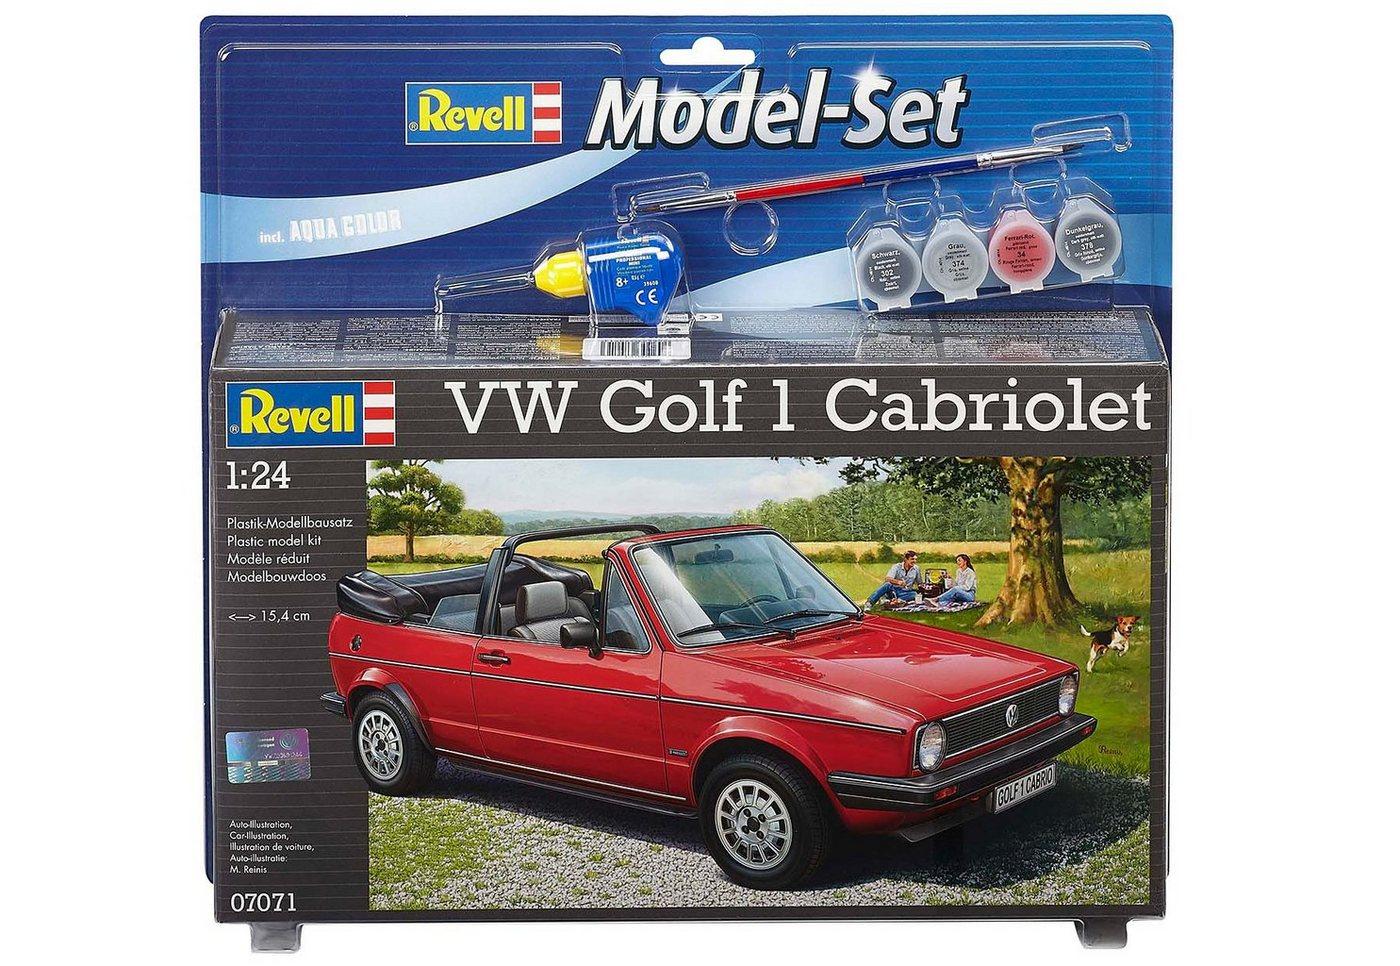 Revell® Modellbausatz Auto mit Zubehör, Maßstab 1:24, »Model Set - VW Golf 1 Cabrio«